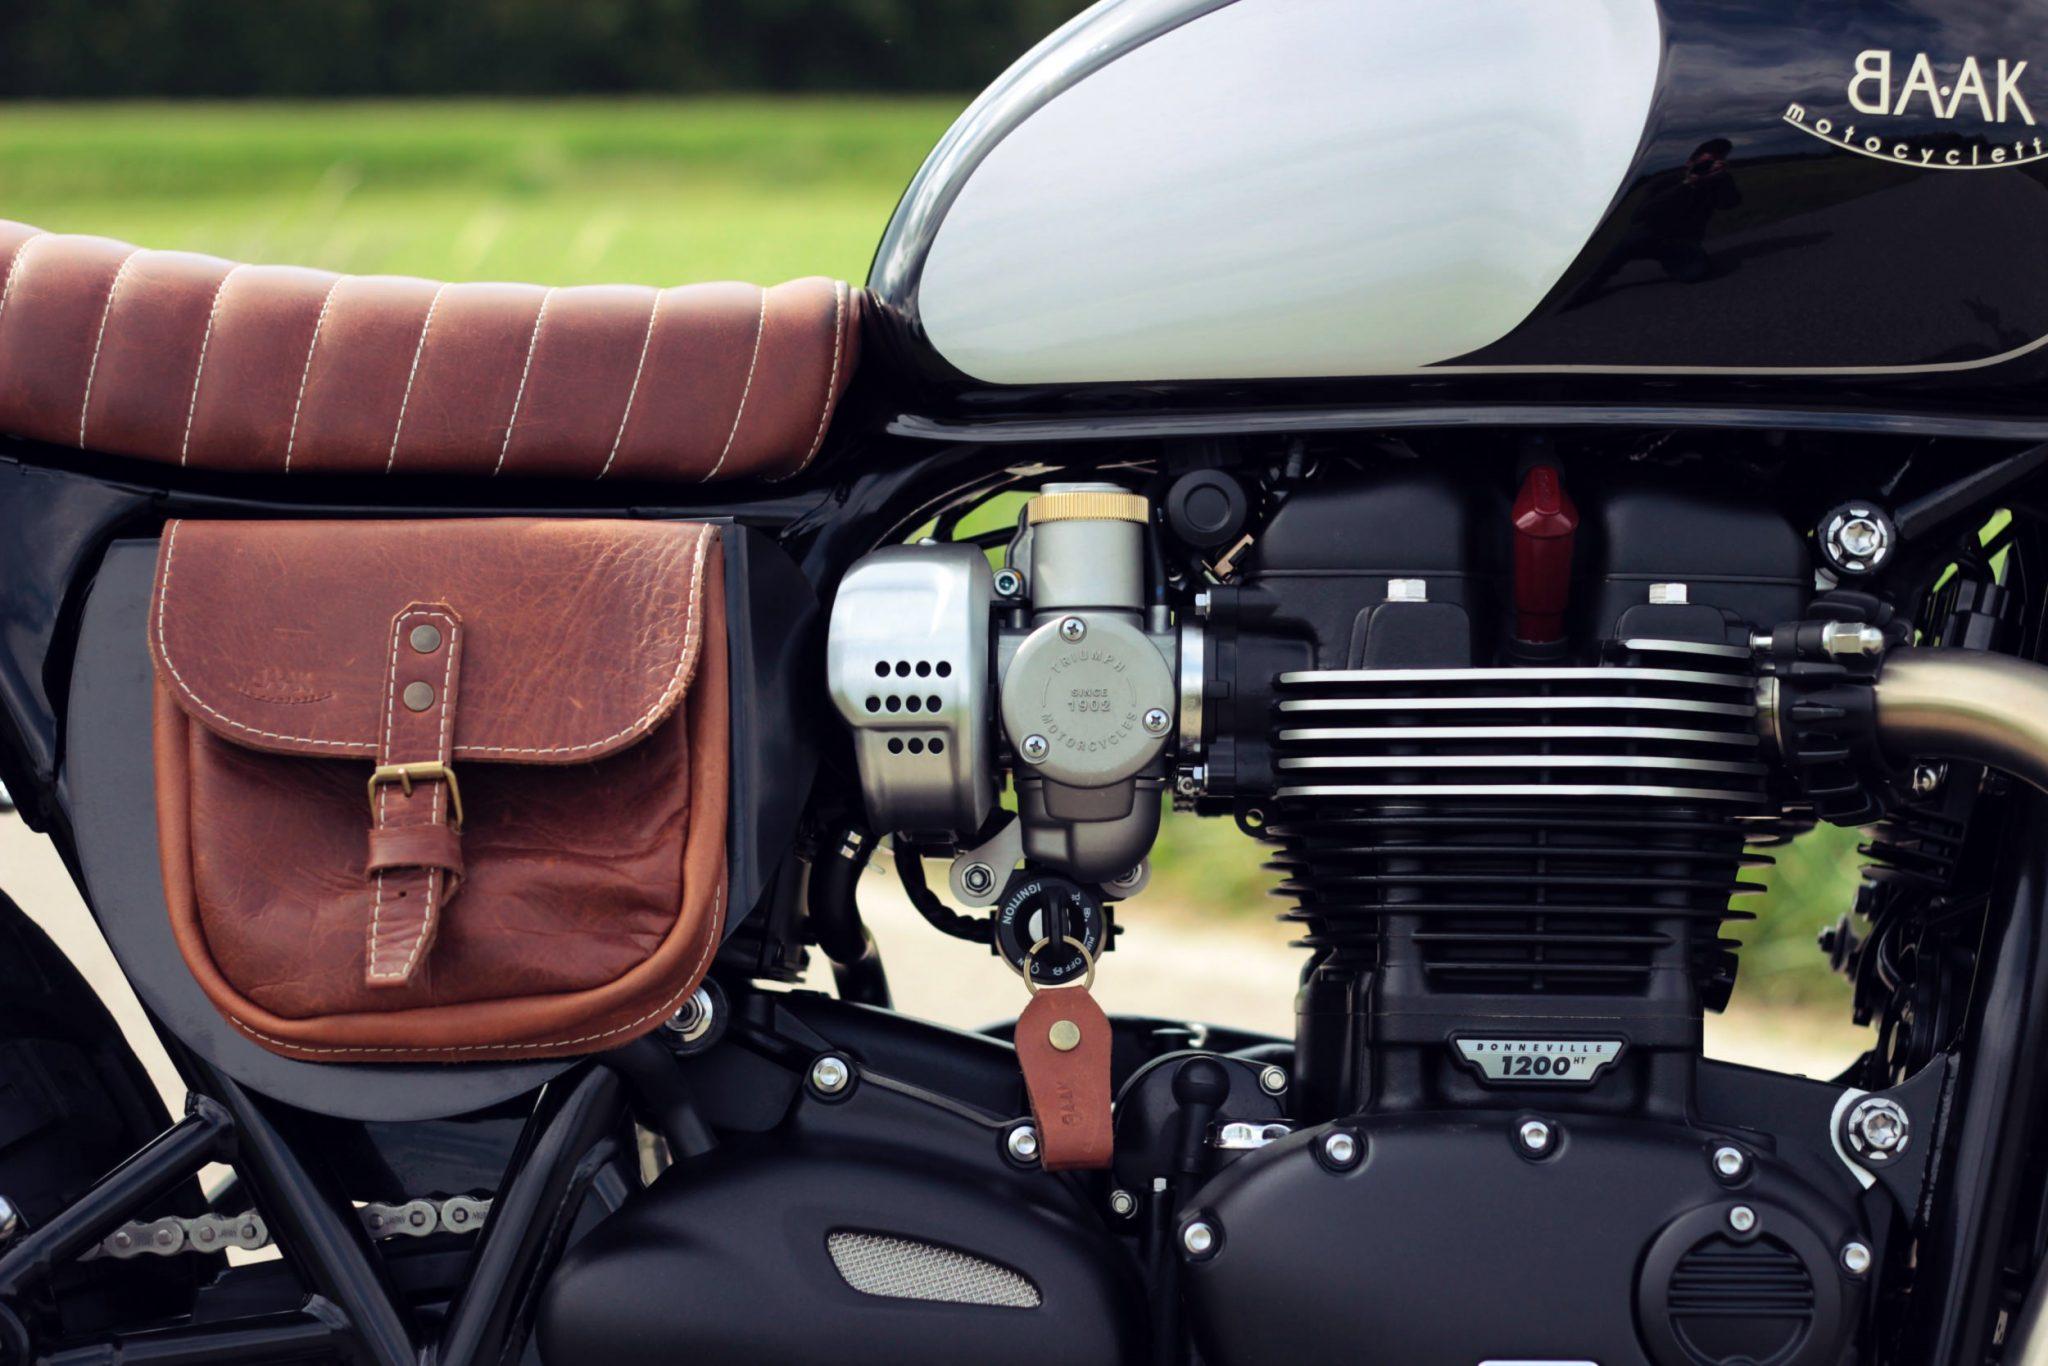 baak motorcycles triumph bonneville t120. Black Bedroom Furniture Sets. Home Design Ideas